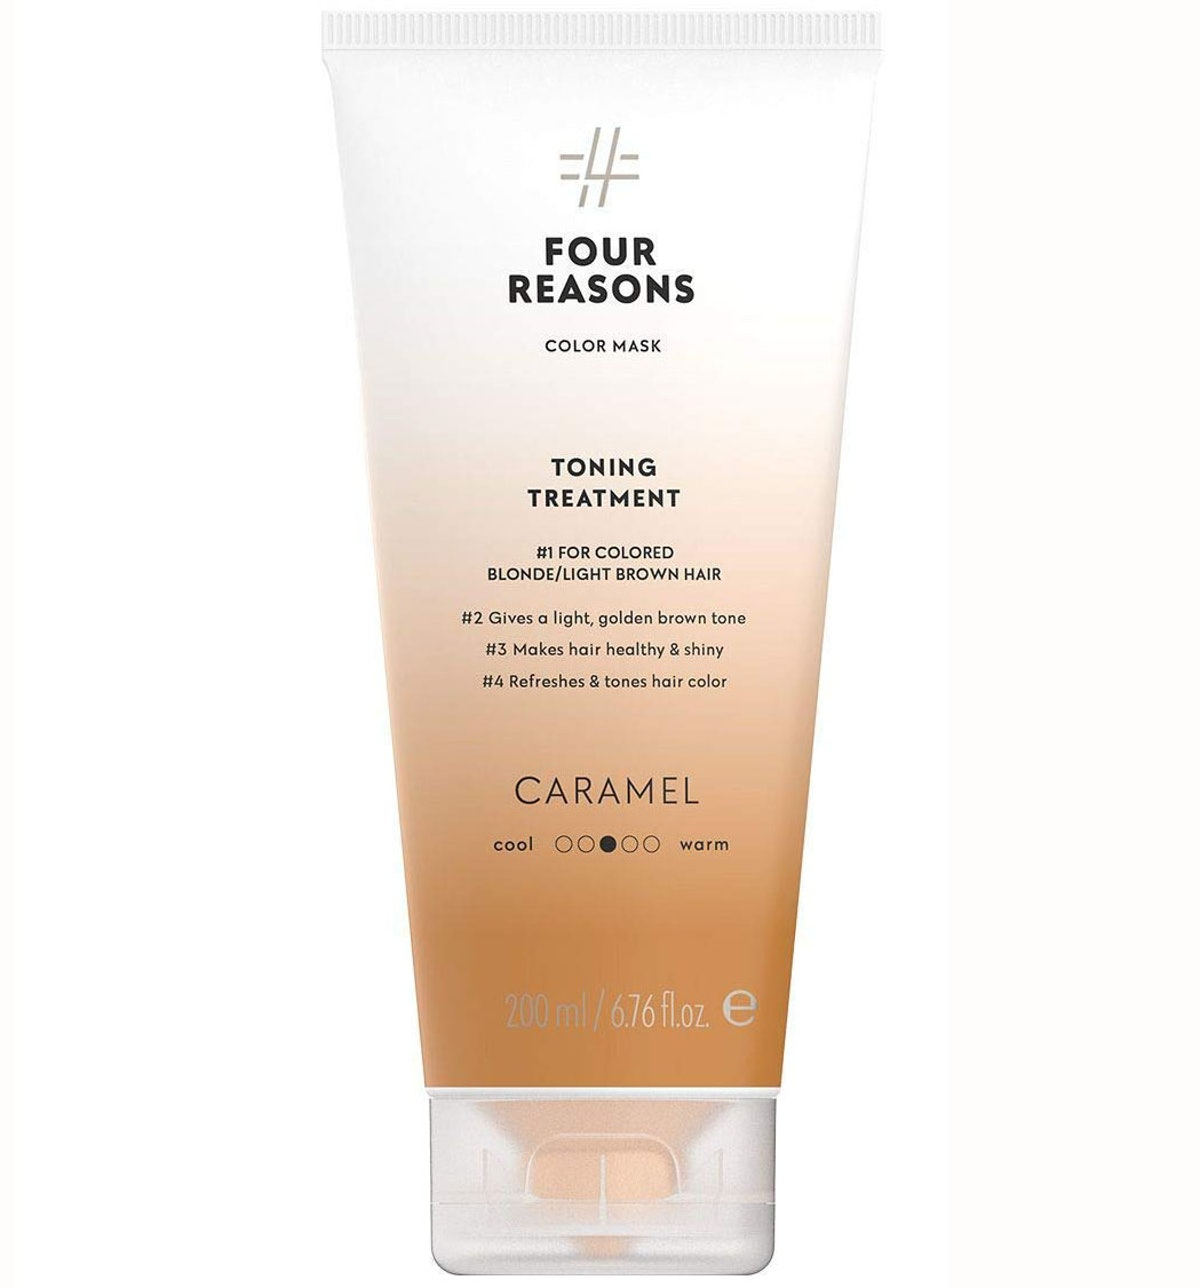 Four Reasons Color Mask - Caramel